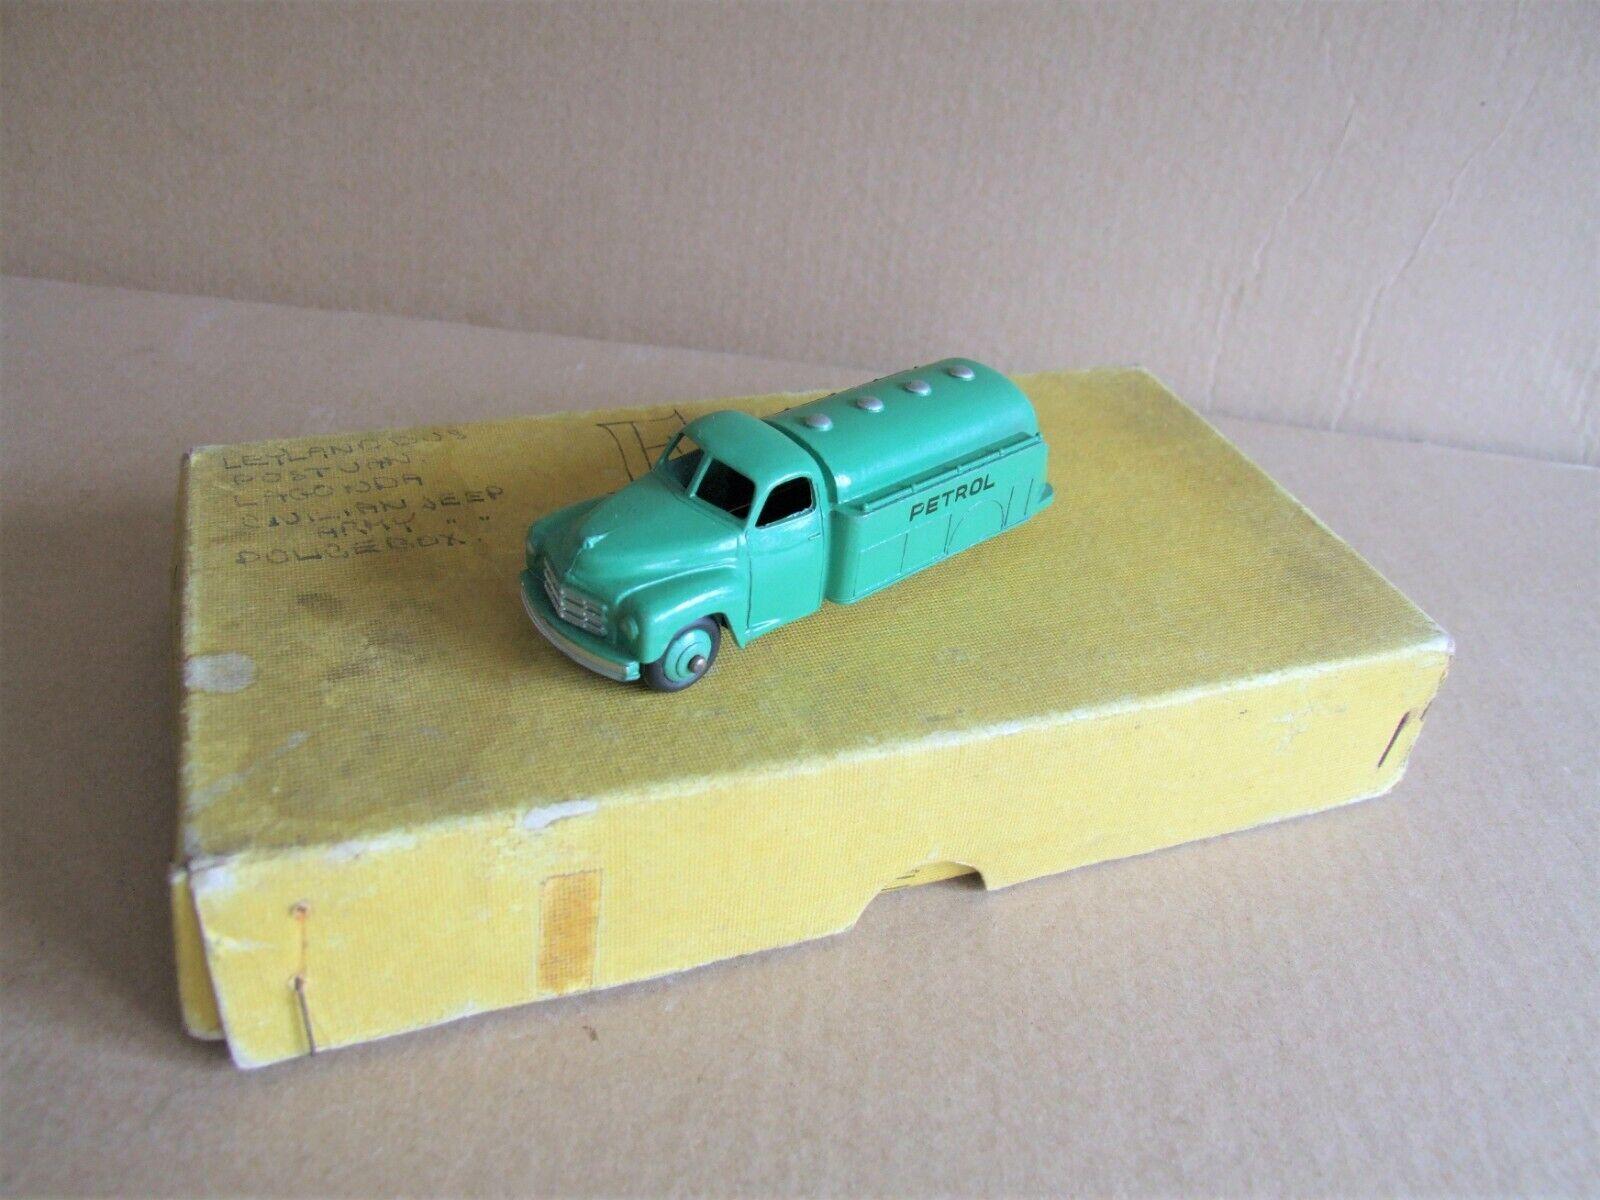 Dinky 30p Petrol Tanker & Trade Box